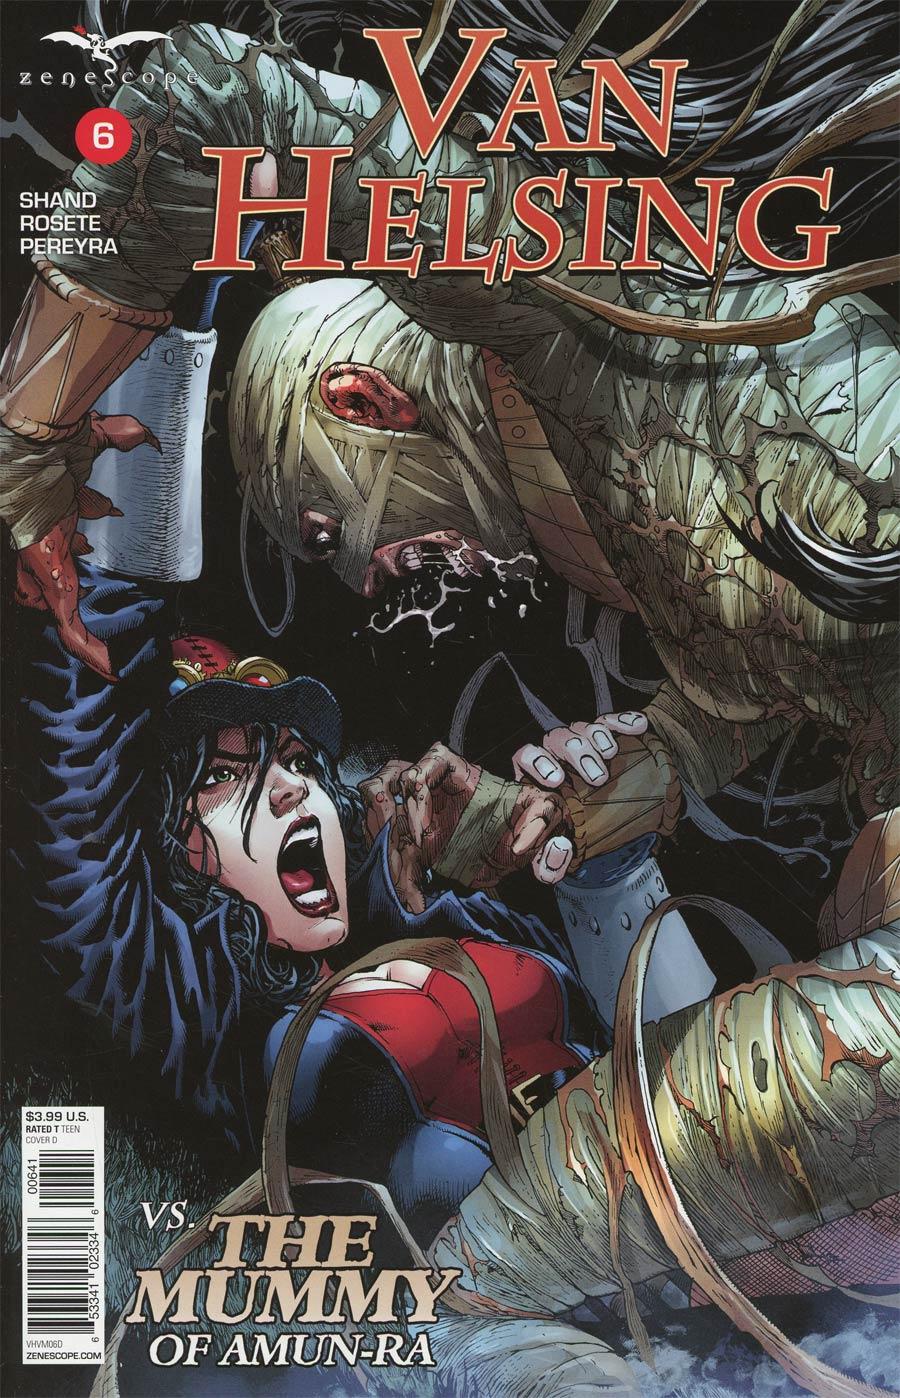 Grimm Fairy Tales Presents Van Helsing vs The Mummy Of Amun-Ra #6 Cover D Netho Diaz